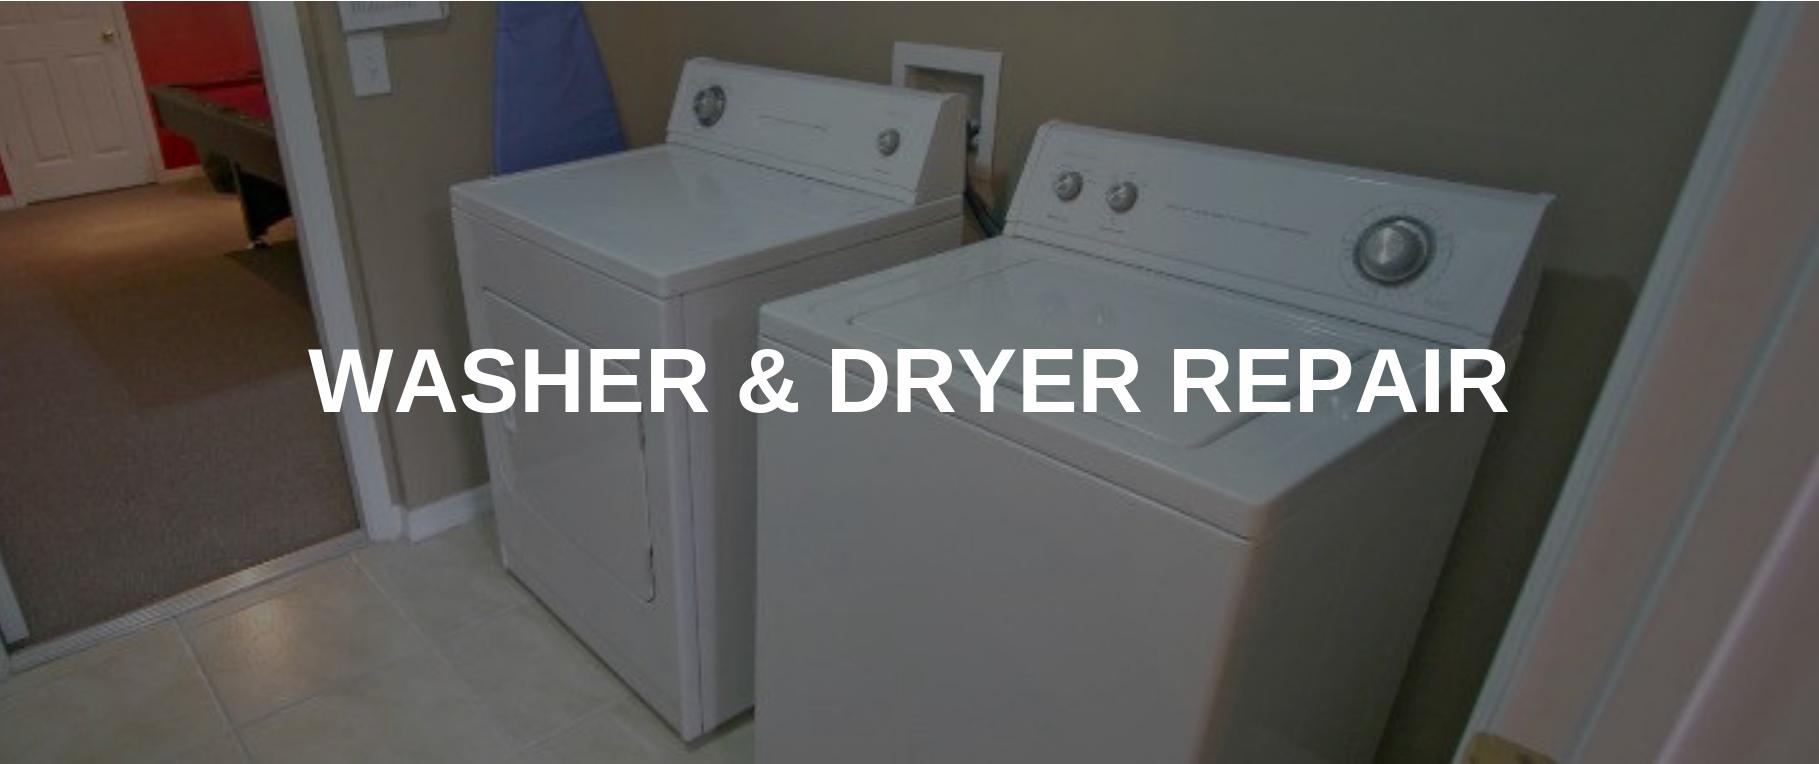 Washer Amp Dyer Repair St Petersburg Fl 727 263 4736